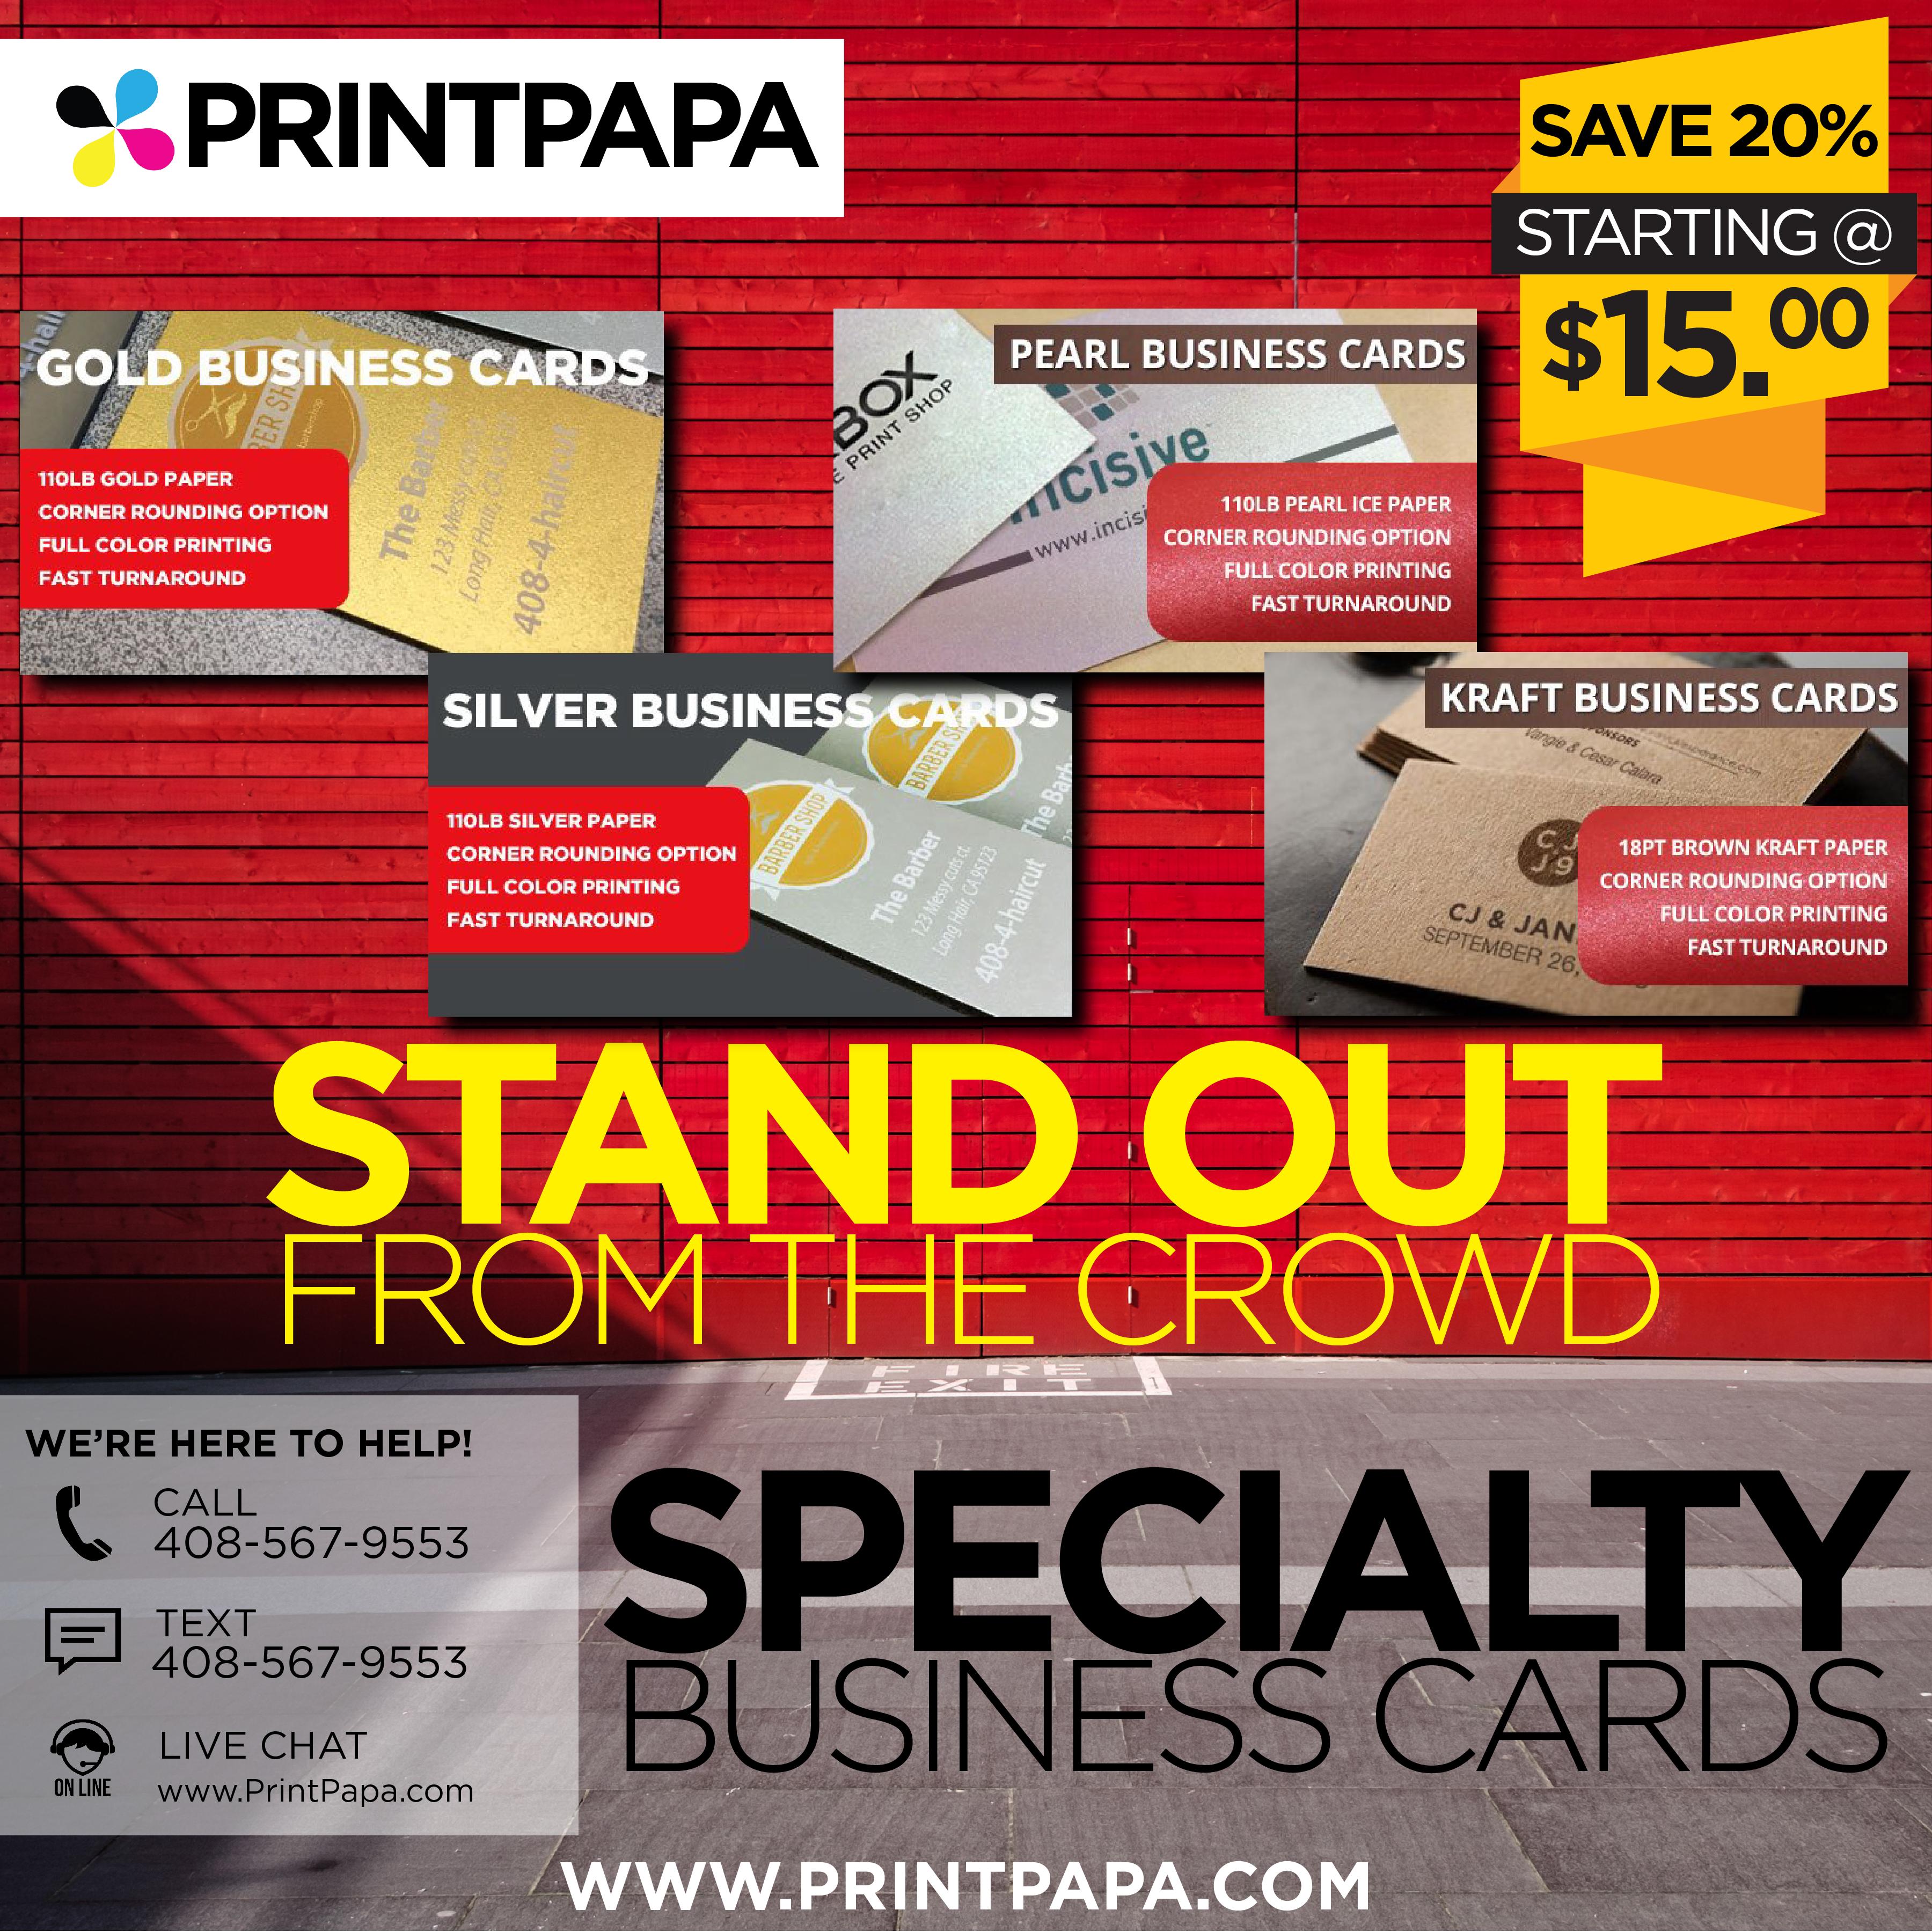 Full color printing company - Online Printing Blog